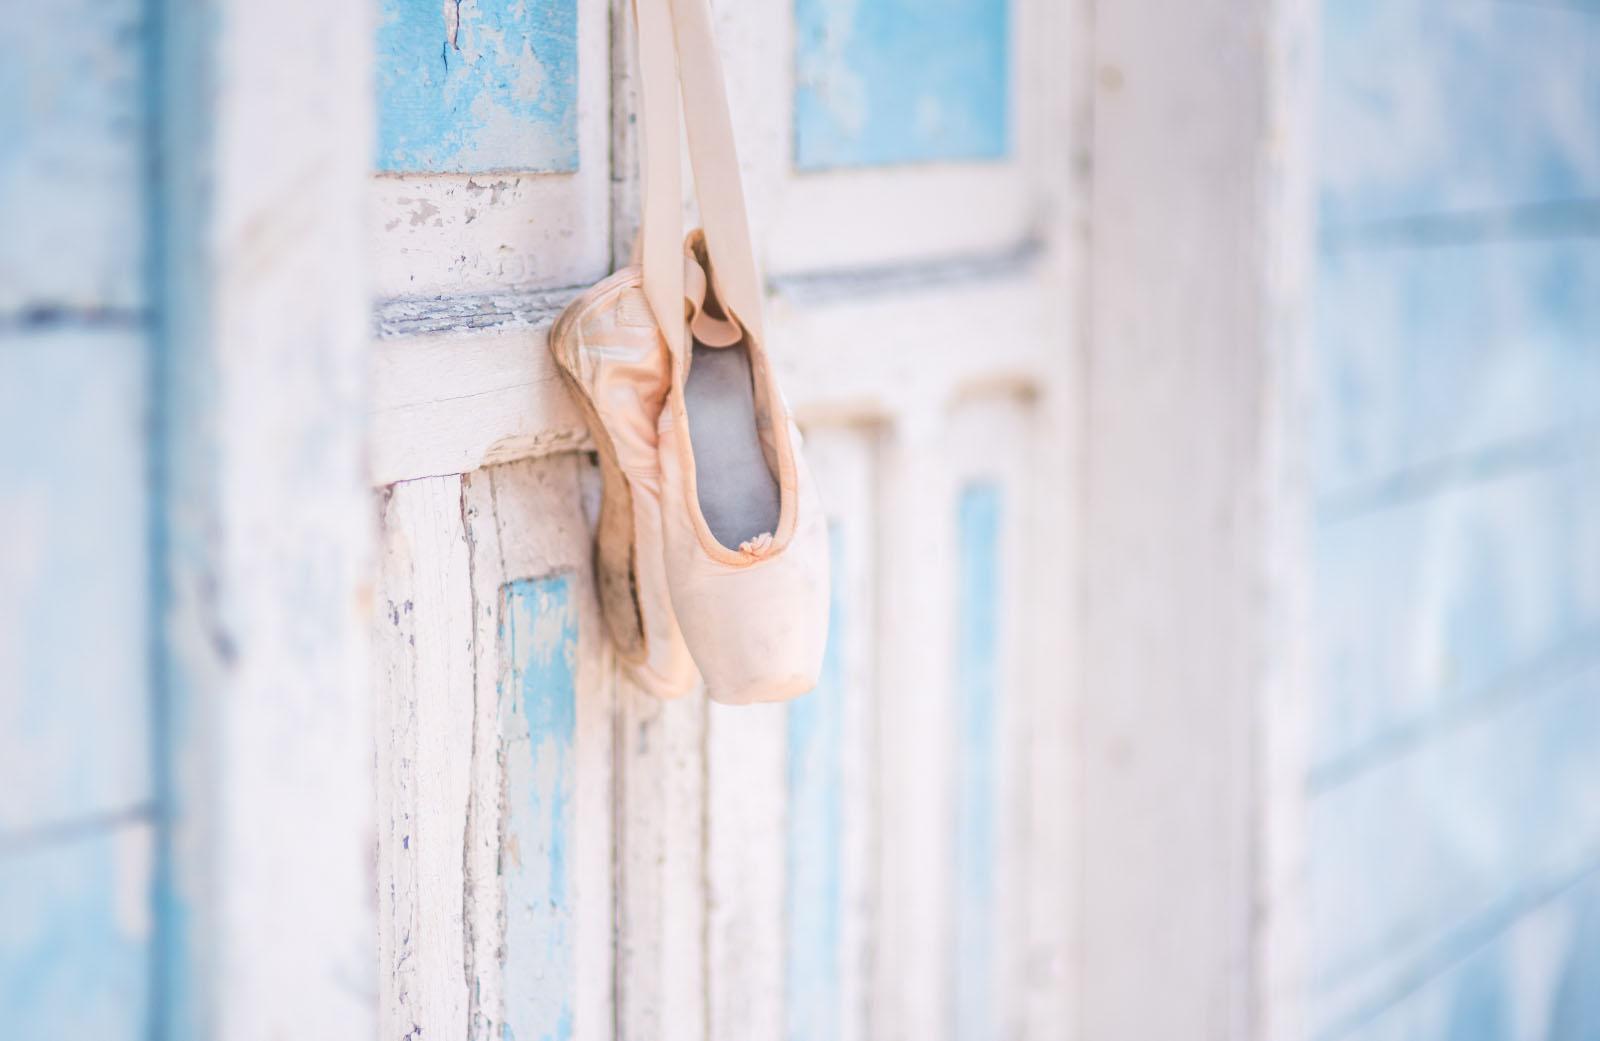 Ballet Slippers on Grunge Wall Texture www.LukeStudios.com